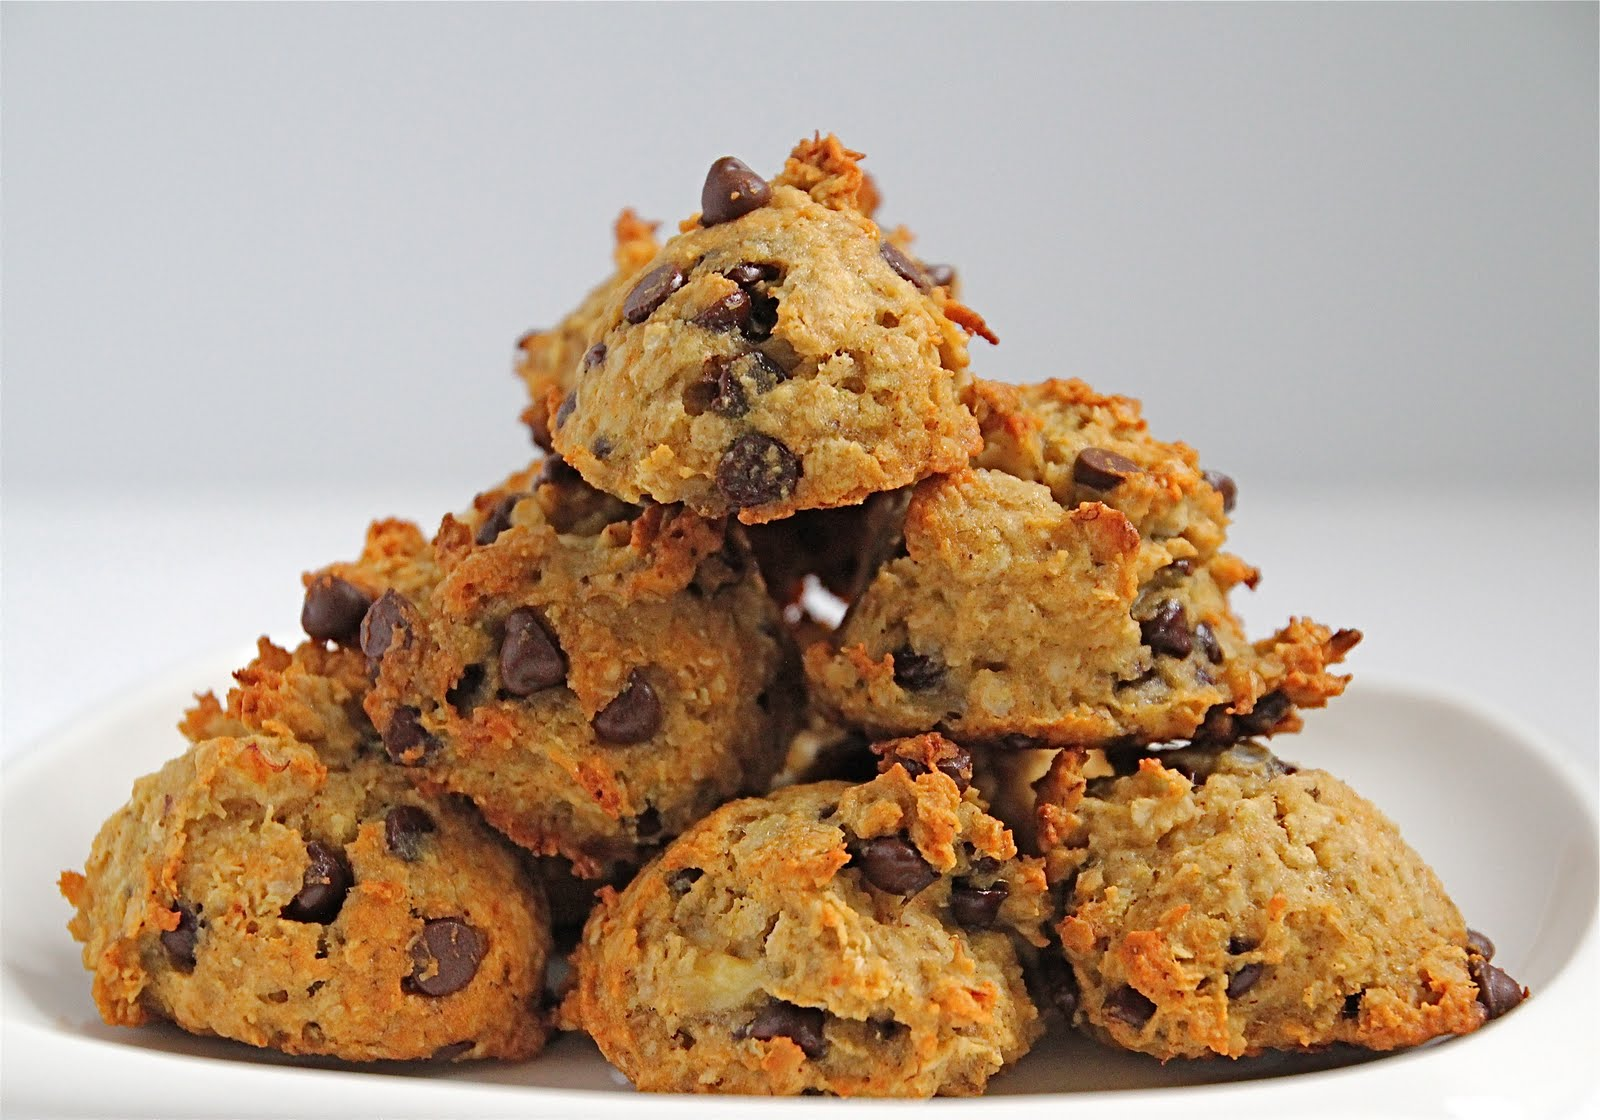 ... Vegan Quinoa Banana Chocolate Chip Cookies - Jeanette's Healthy Living